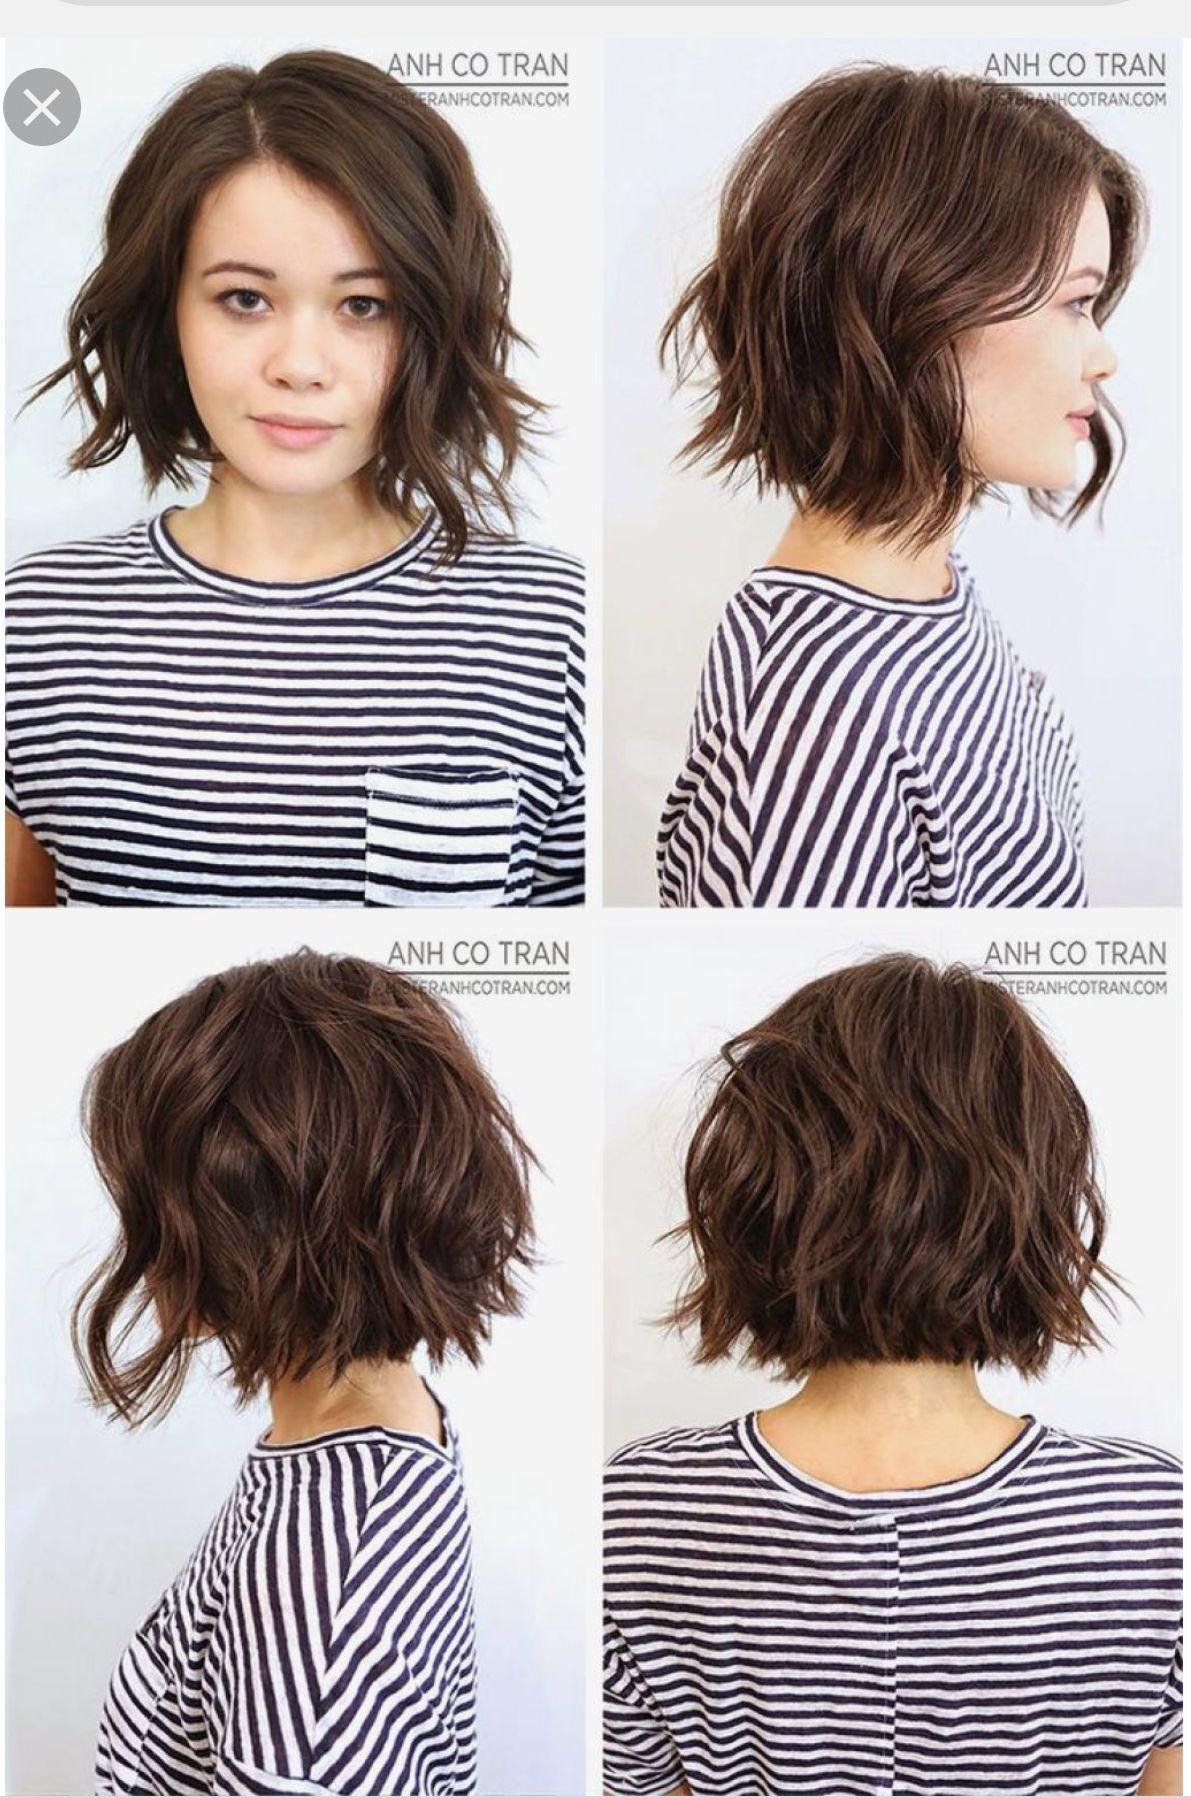 Pin By Shelly Fearno Waterman On Hair Textured Haircut Wavy Bob Haircuts Haircuts For Wavy Hair